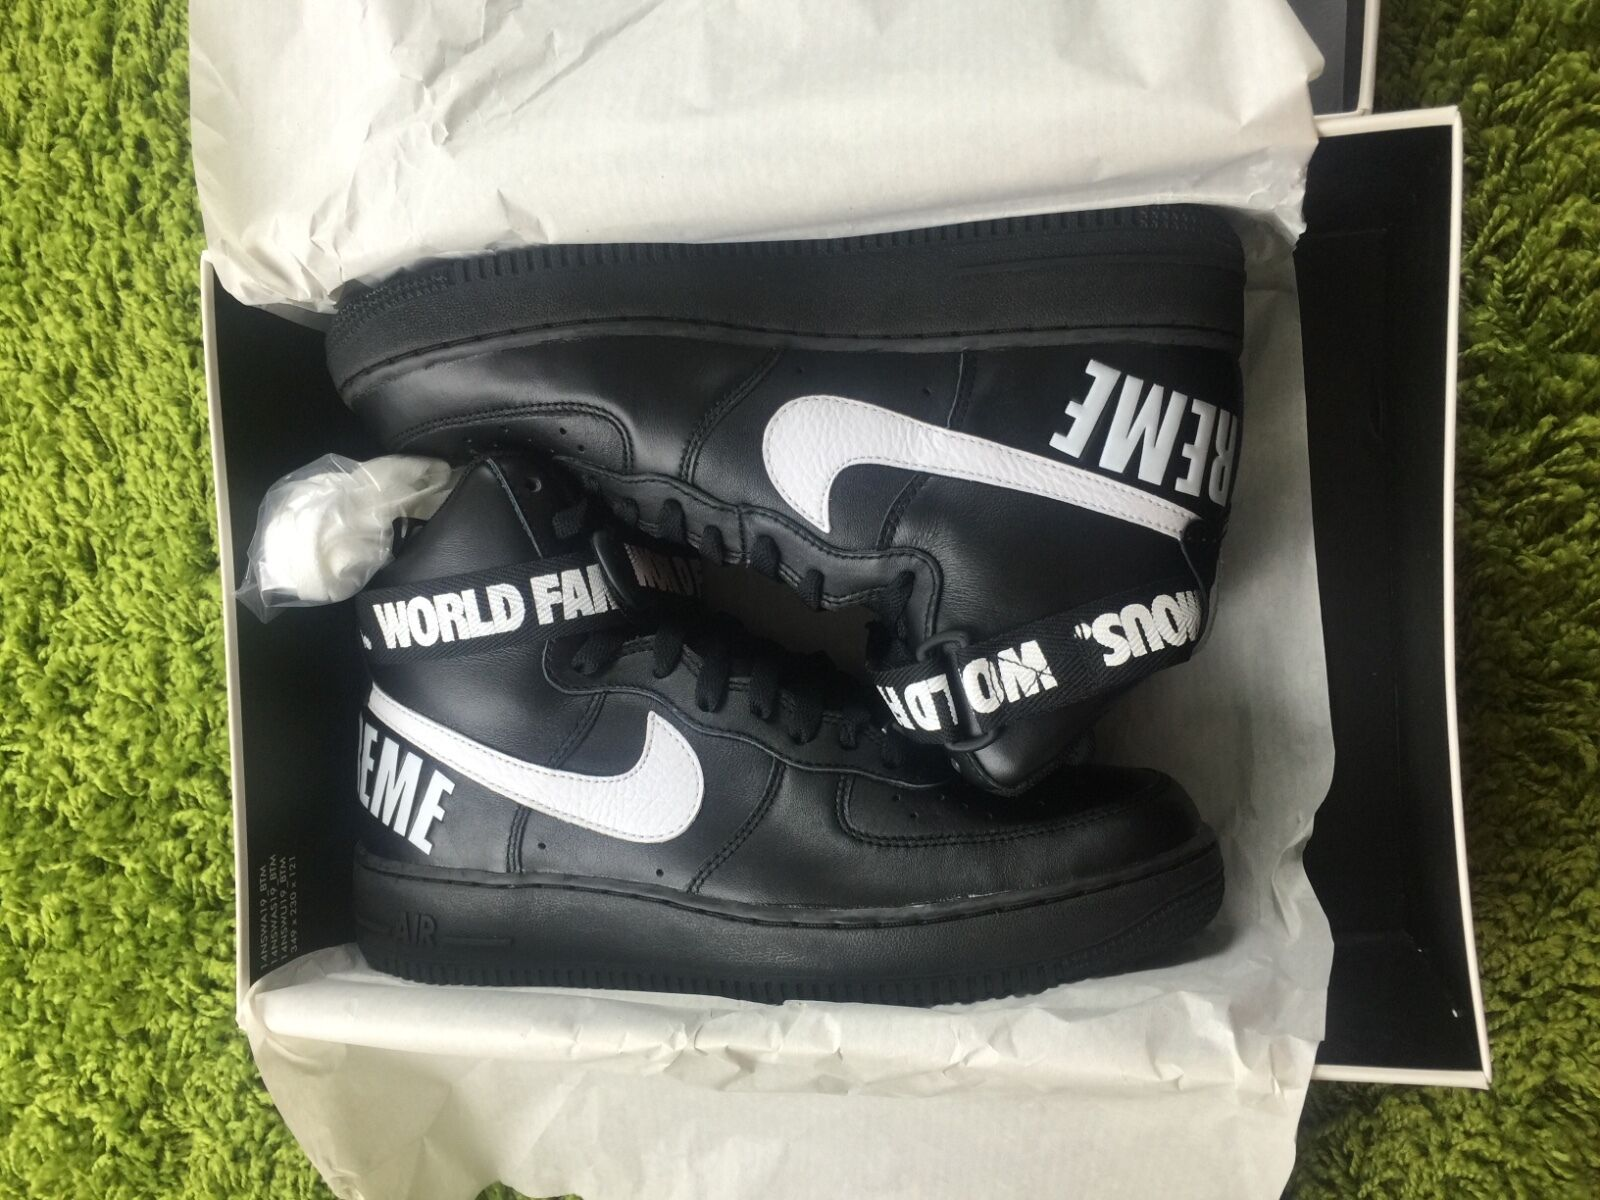 Supreme FW 2014 Nike Air Force 1 High SP Black White